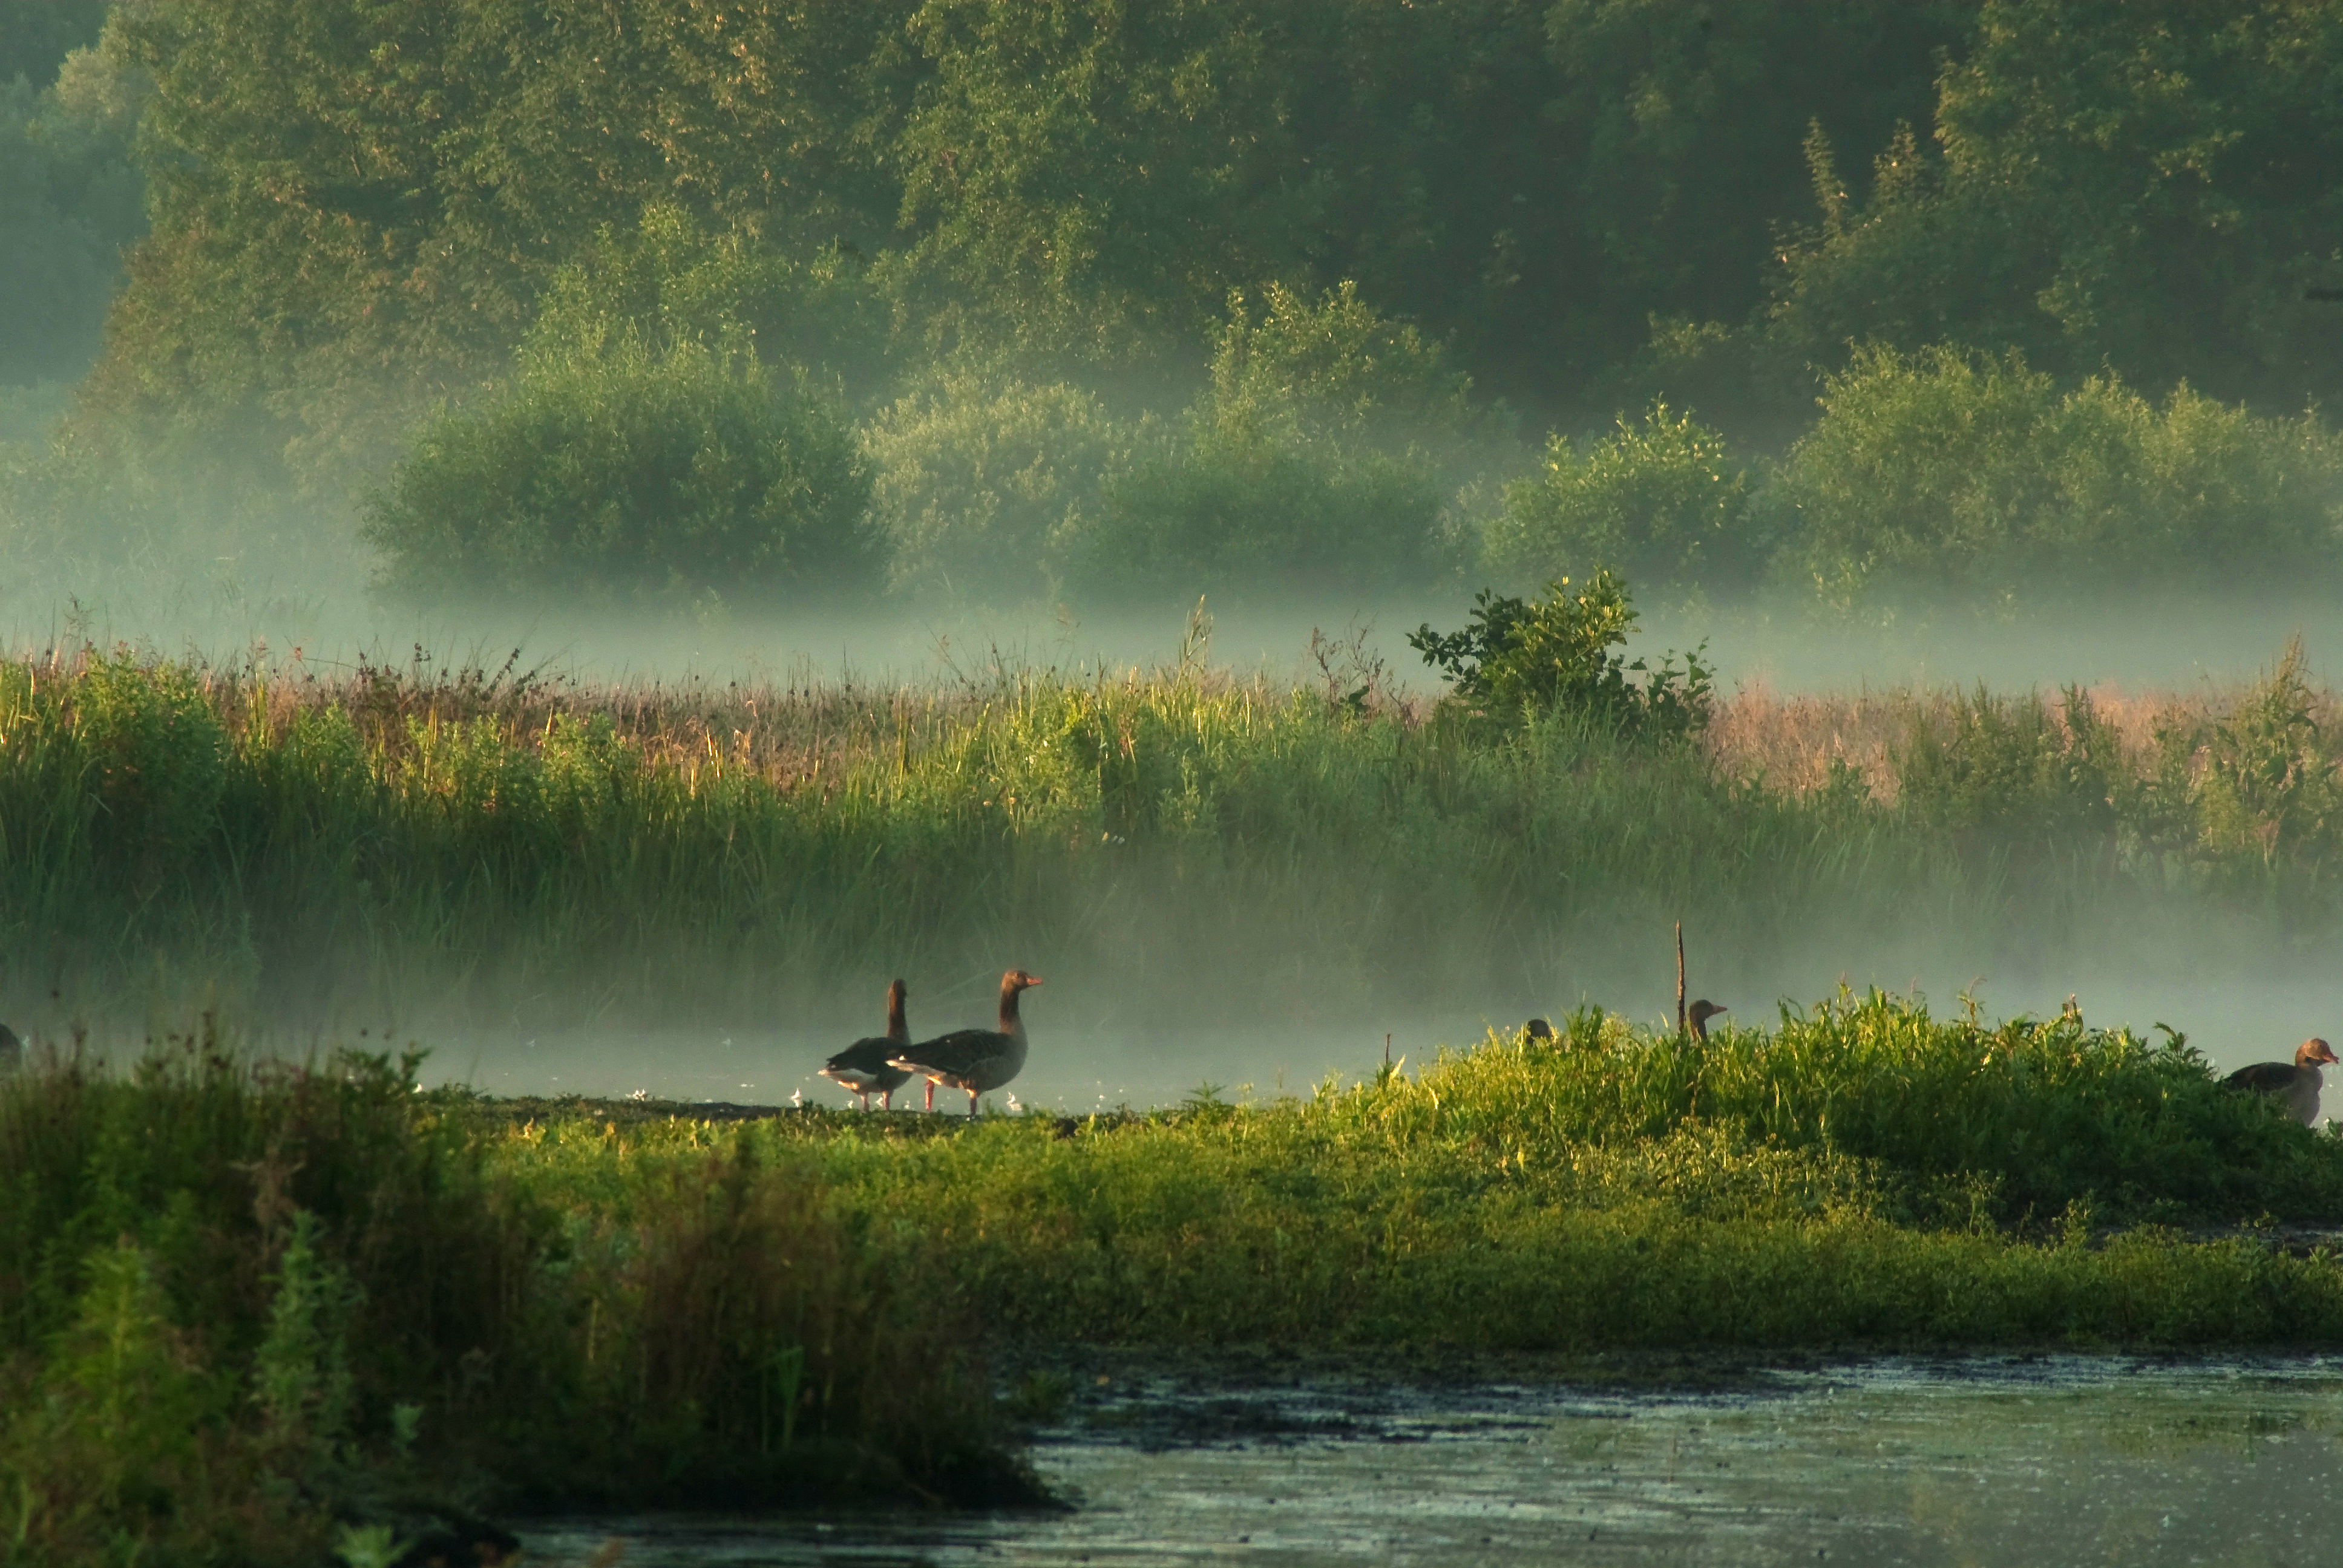 In Misty Morningland